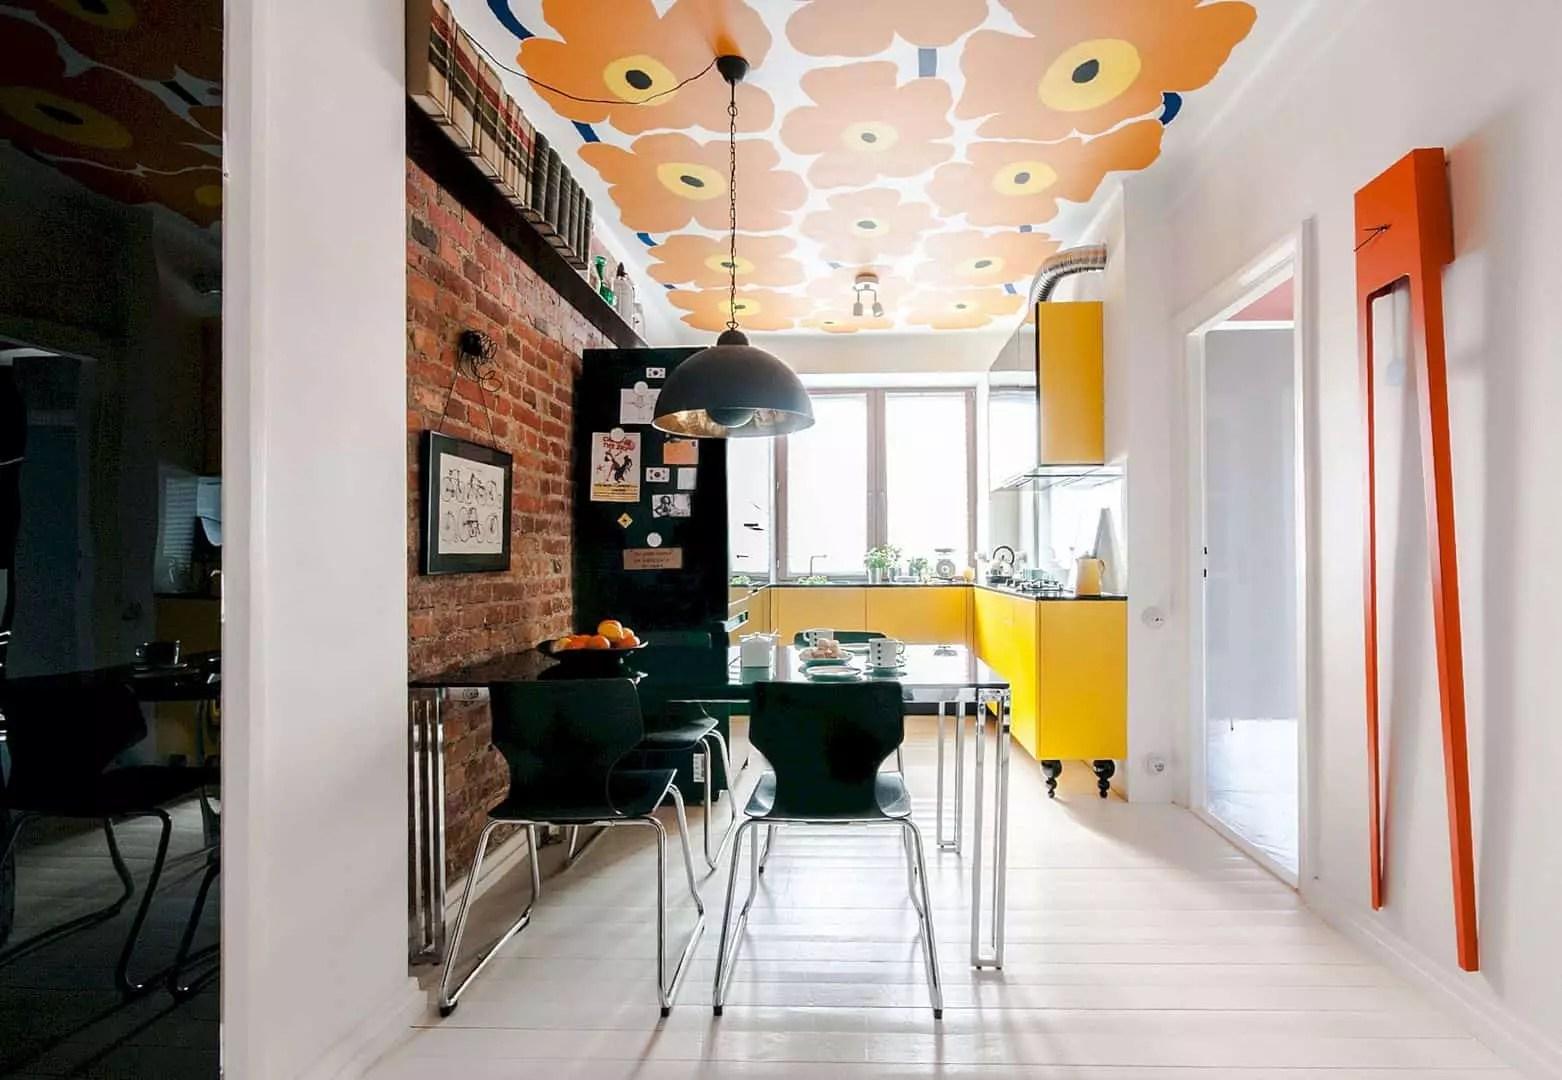 Kamienica Warszawa: A Classic Apartment with Minimalist and Scandinavian Interior Design